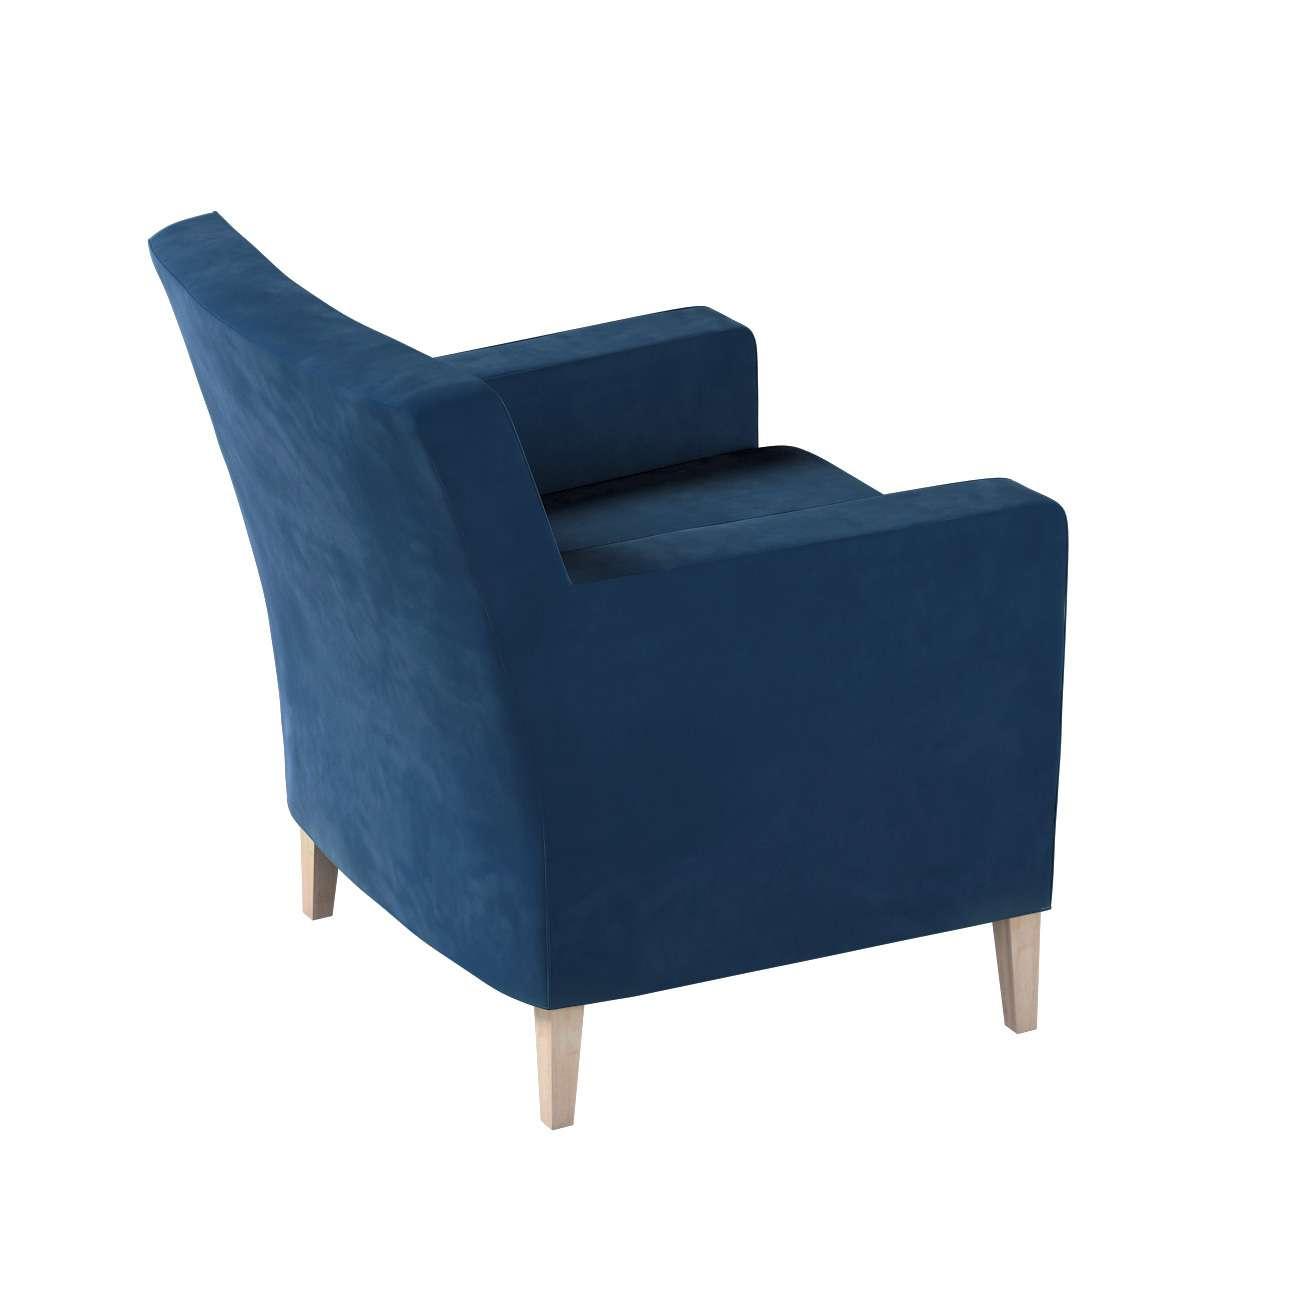 Pokrowiec na fotel Karlstad w kolekcji Velvet, tkanina: 704-29